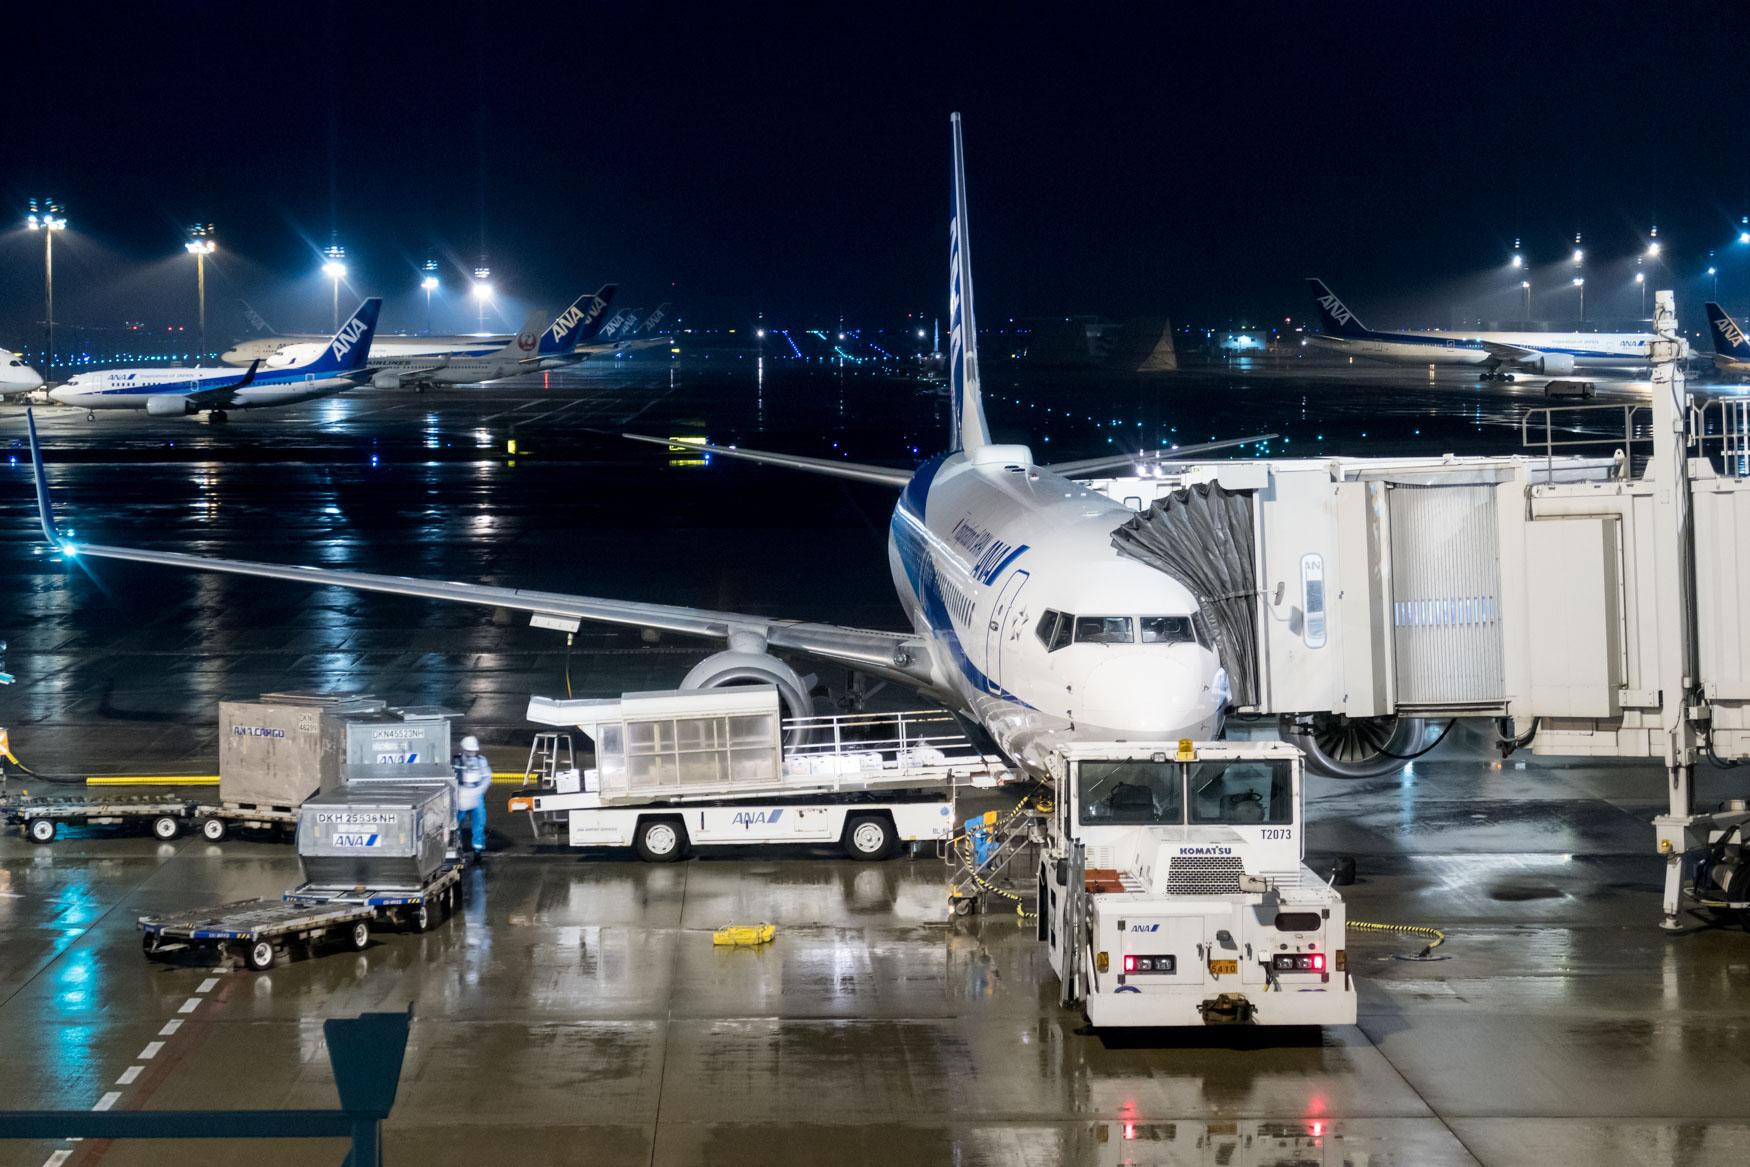 ANA All Nippon Airways Boeing 737-800